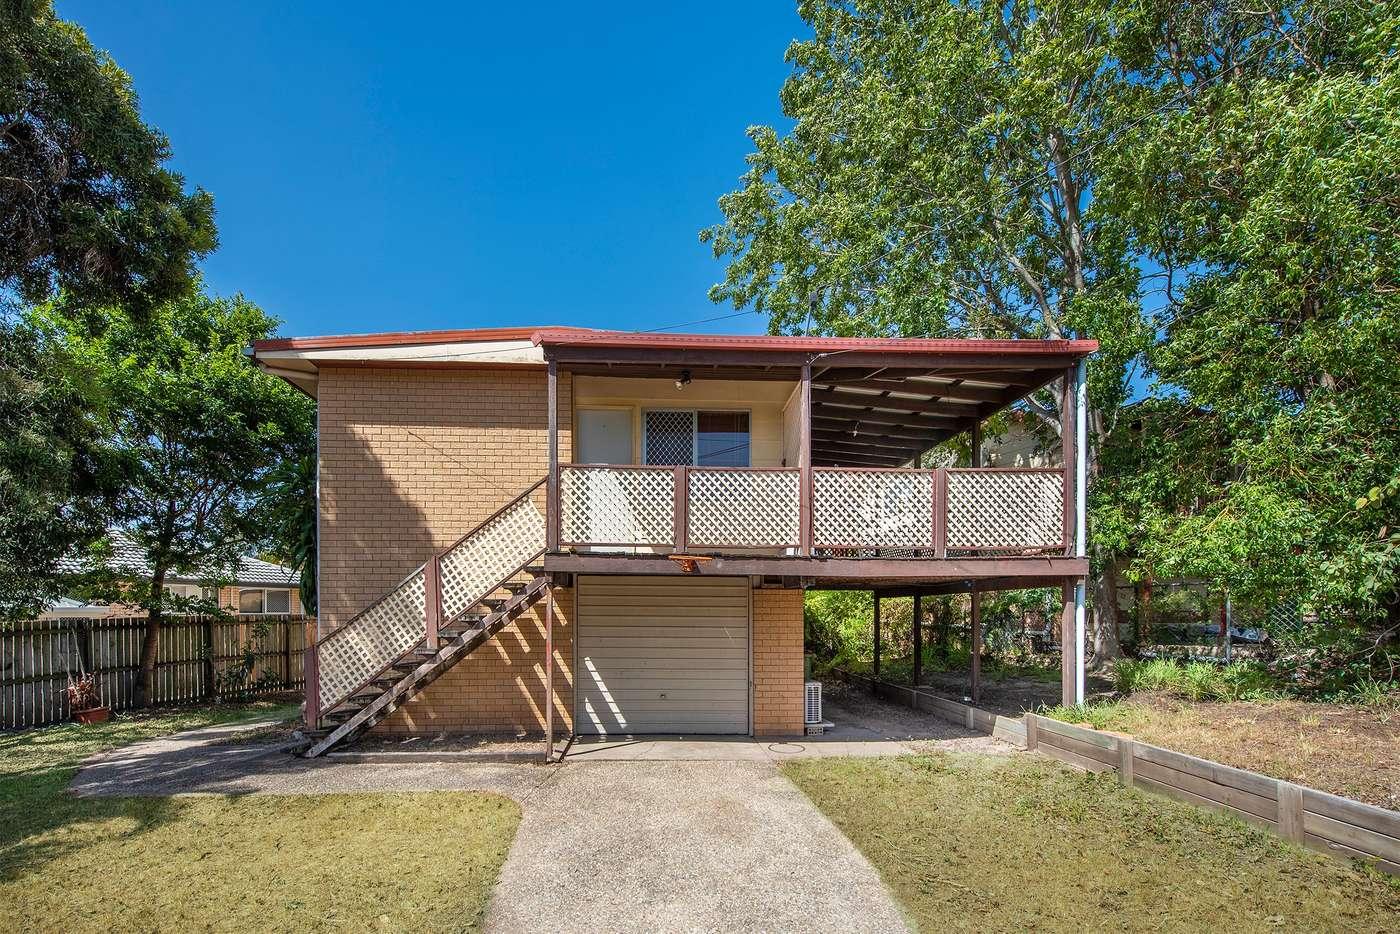 Main view of Homely house listing, 3 Balmoral Street, Slacks Creek QLD 4127